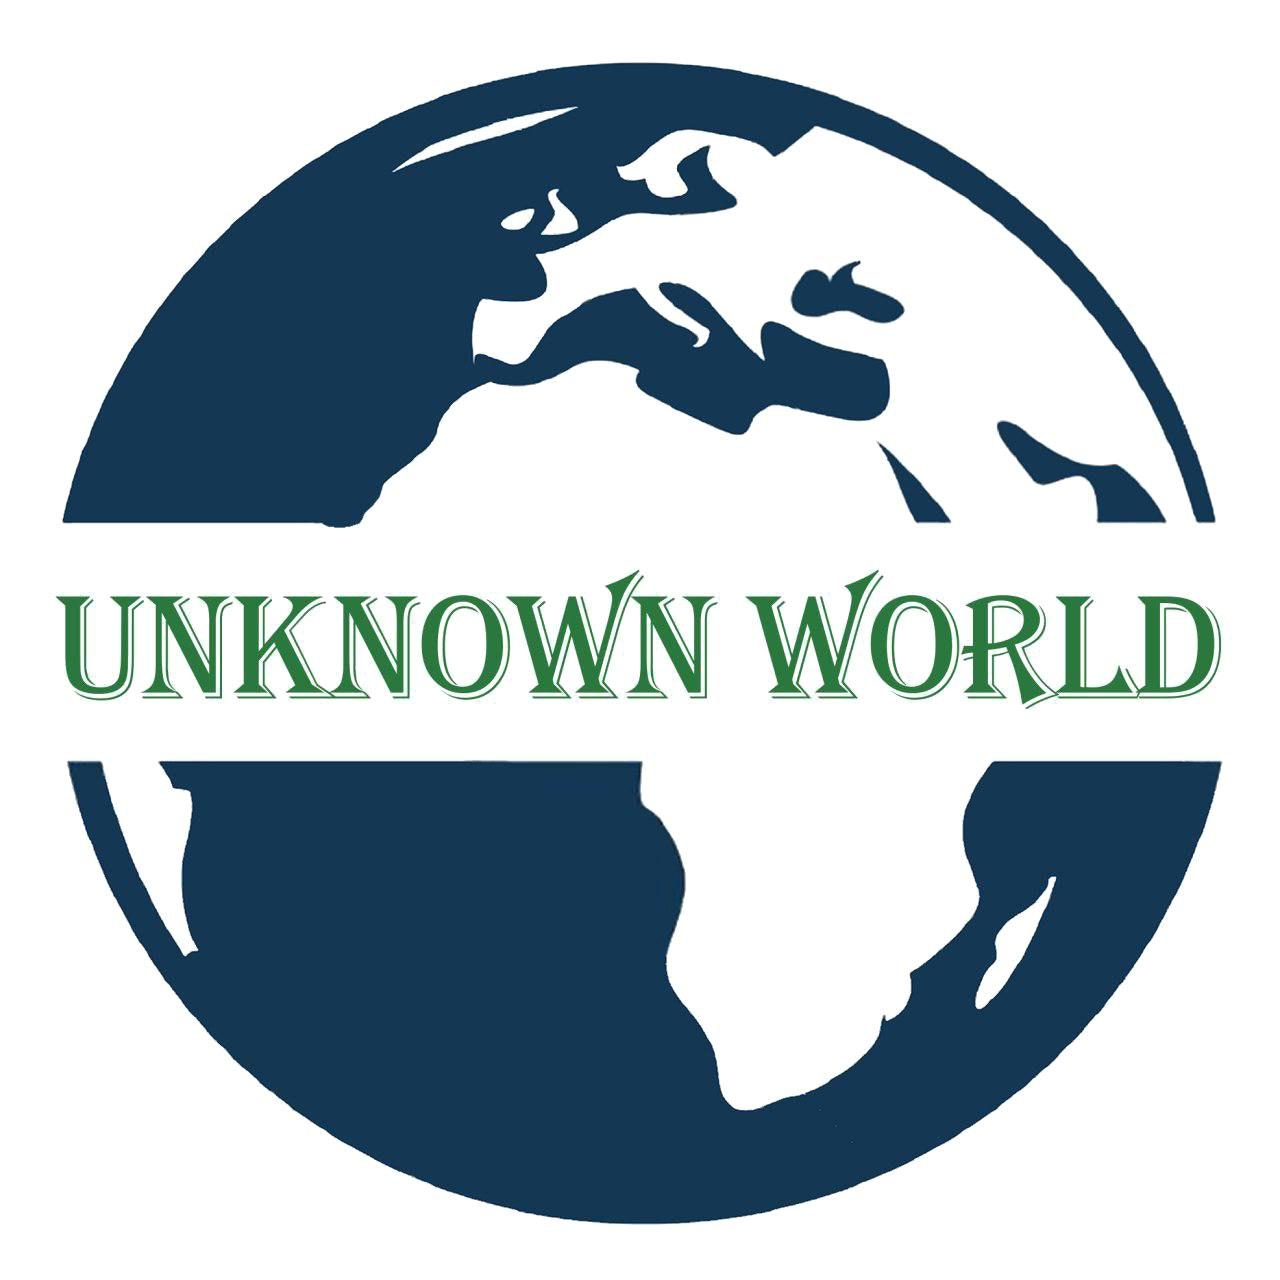 theunknownworld